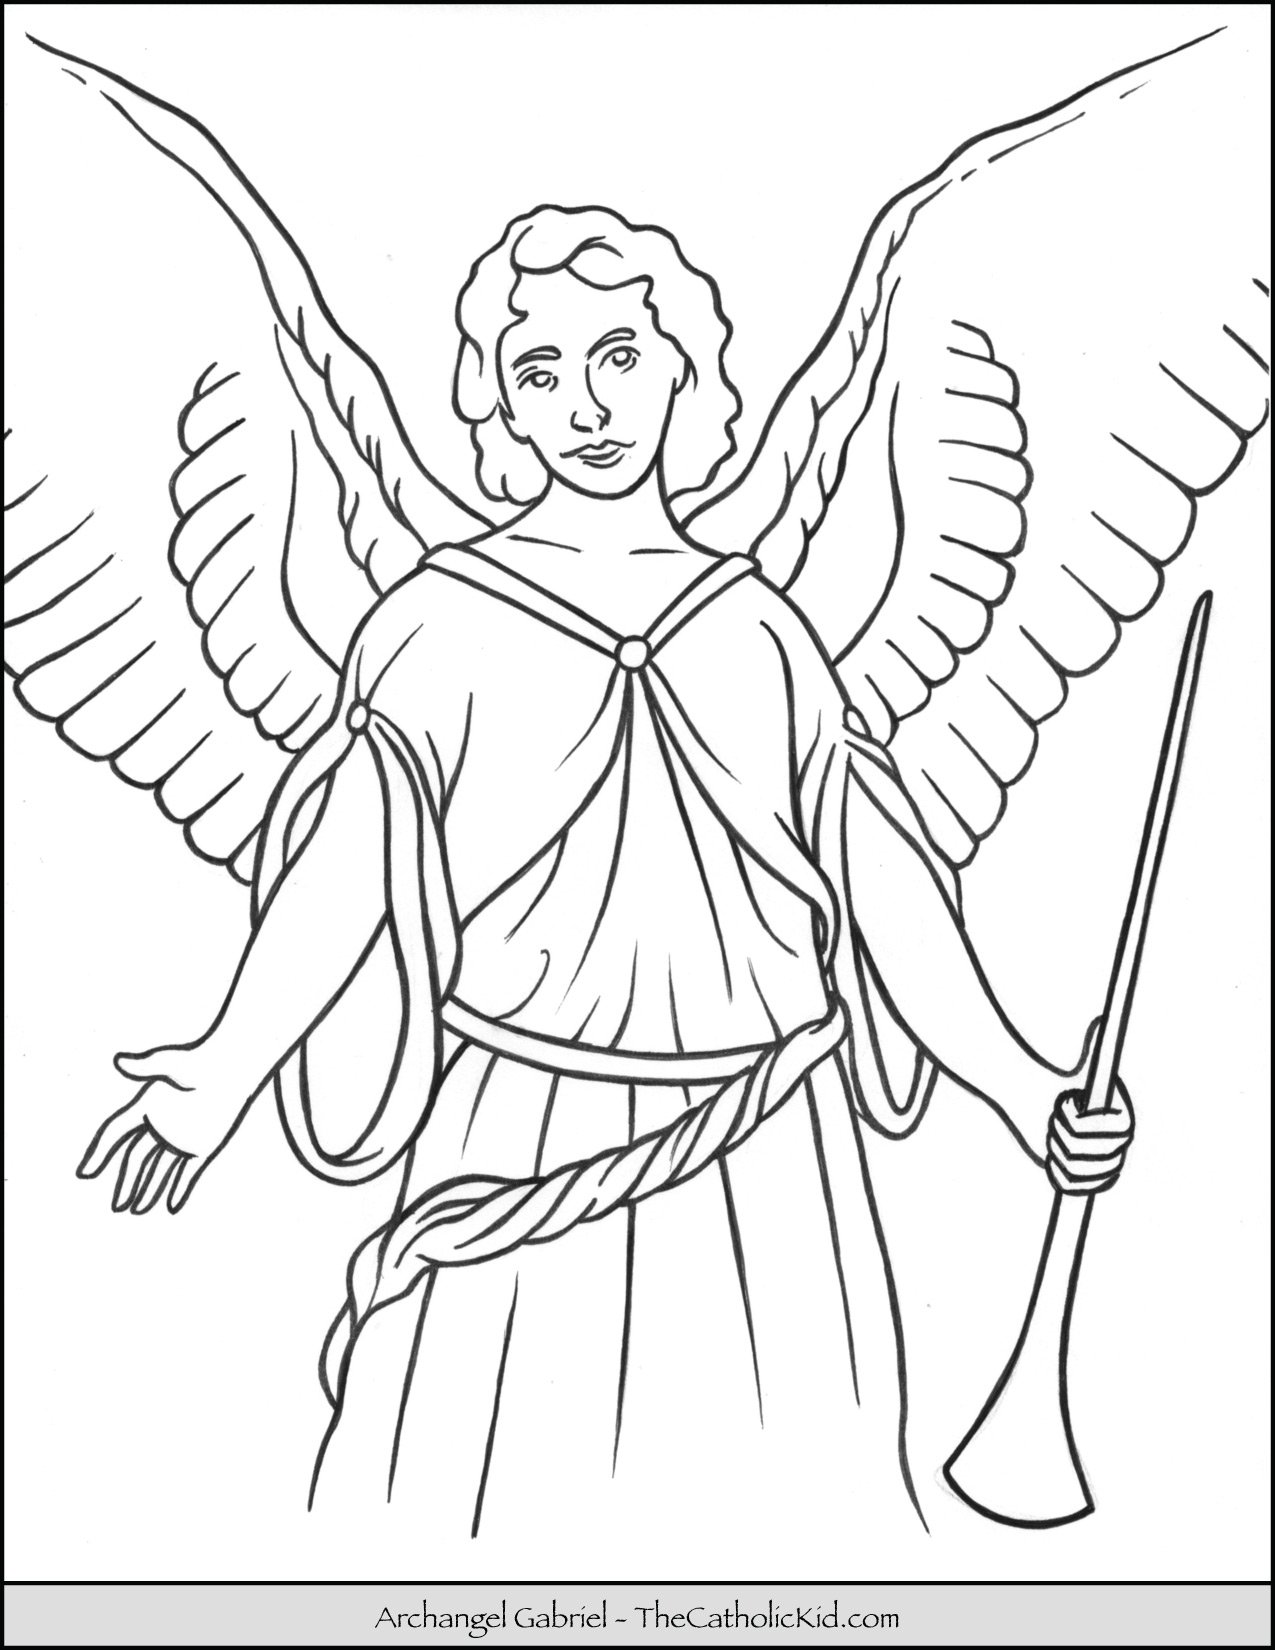 Archangel Gabriel Coloring-page